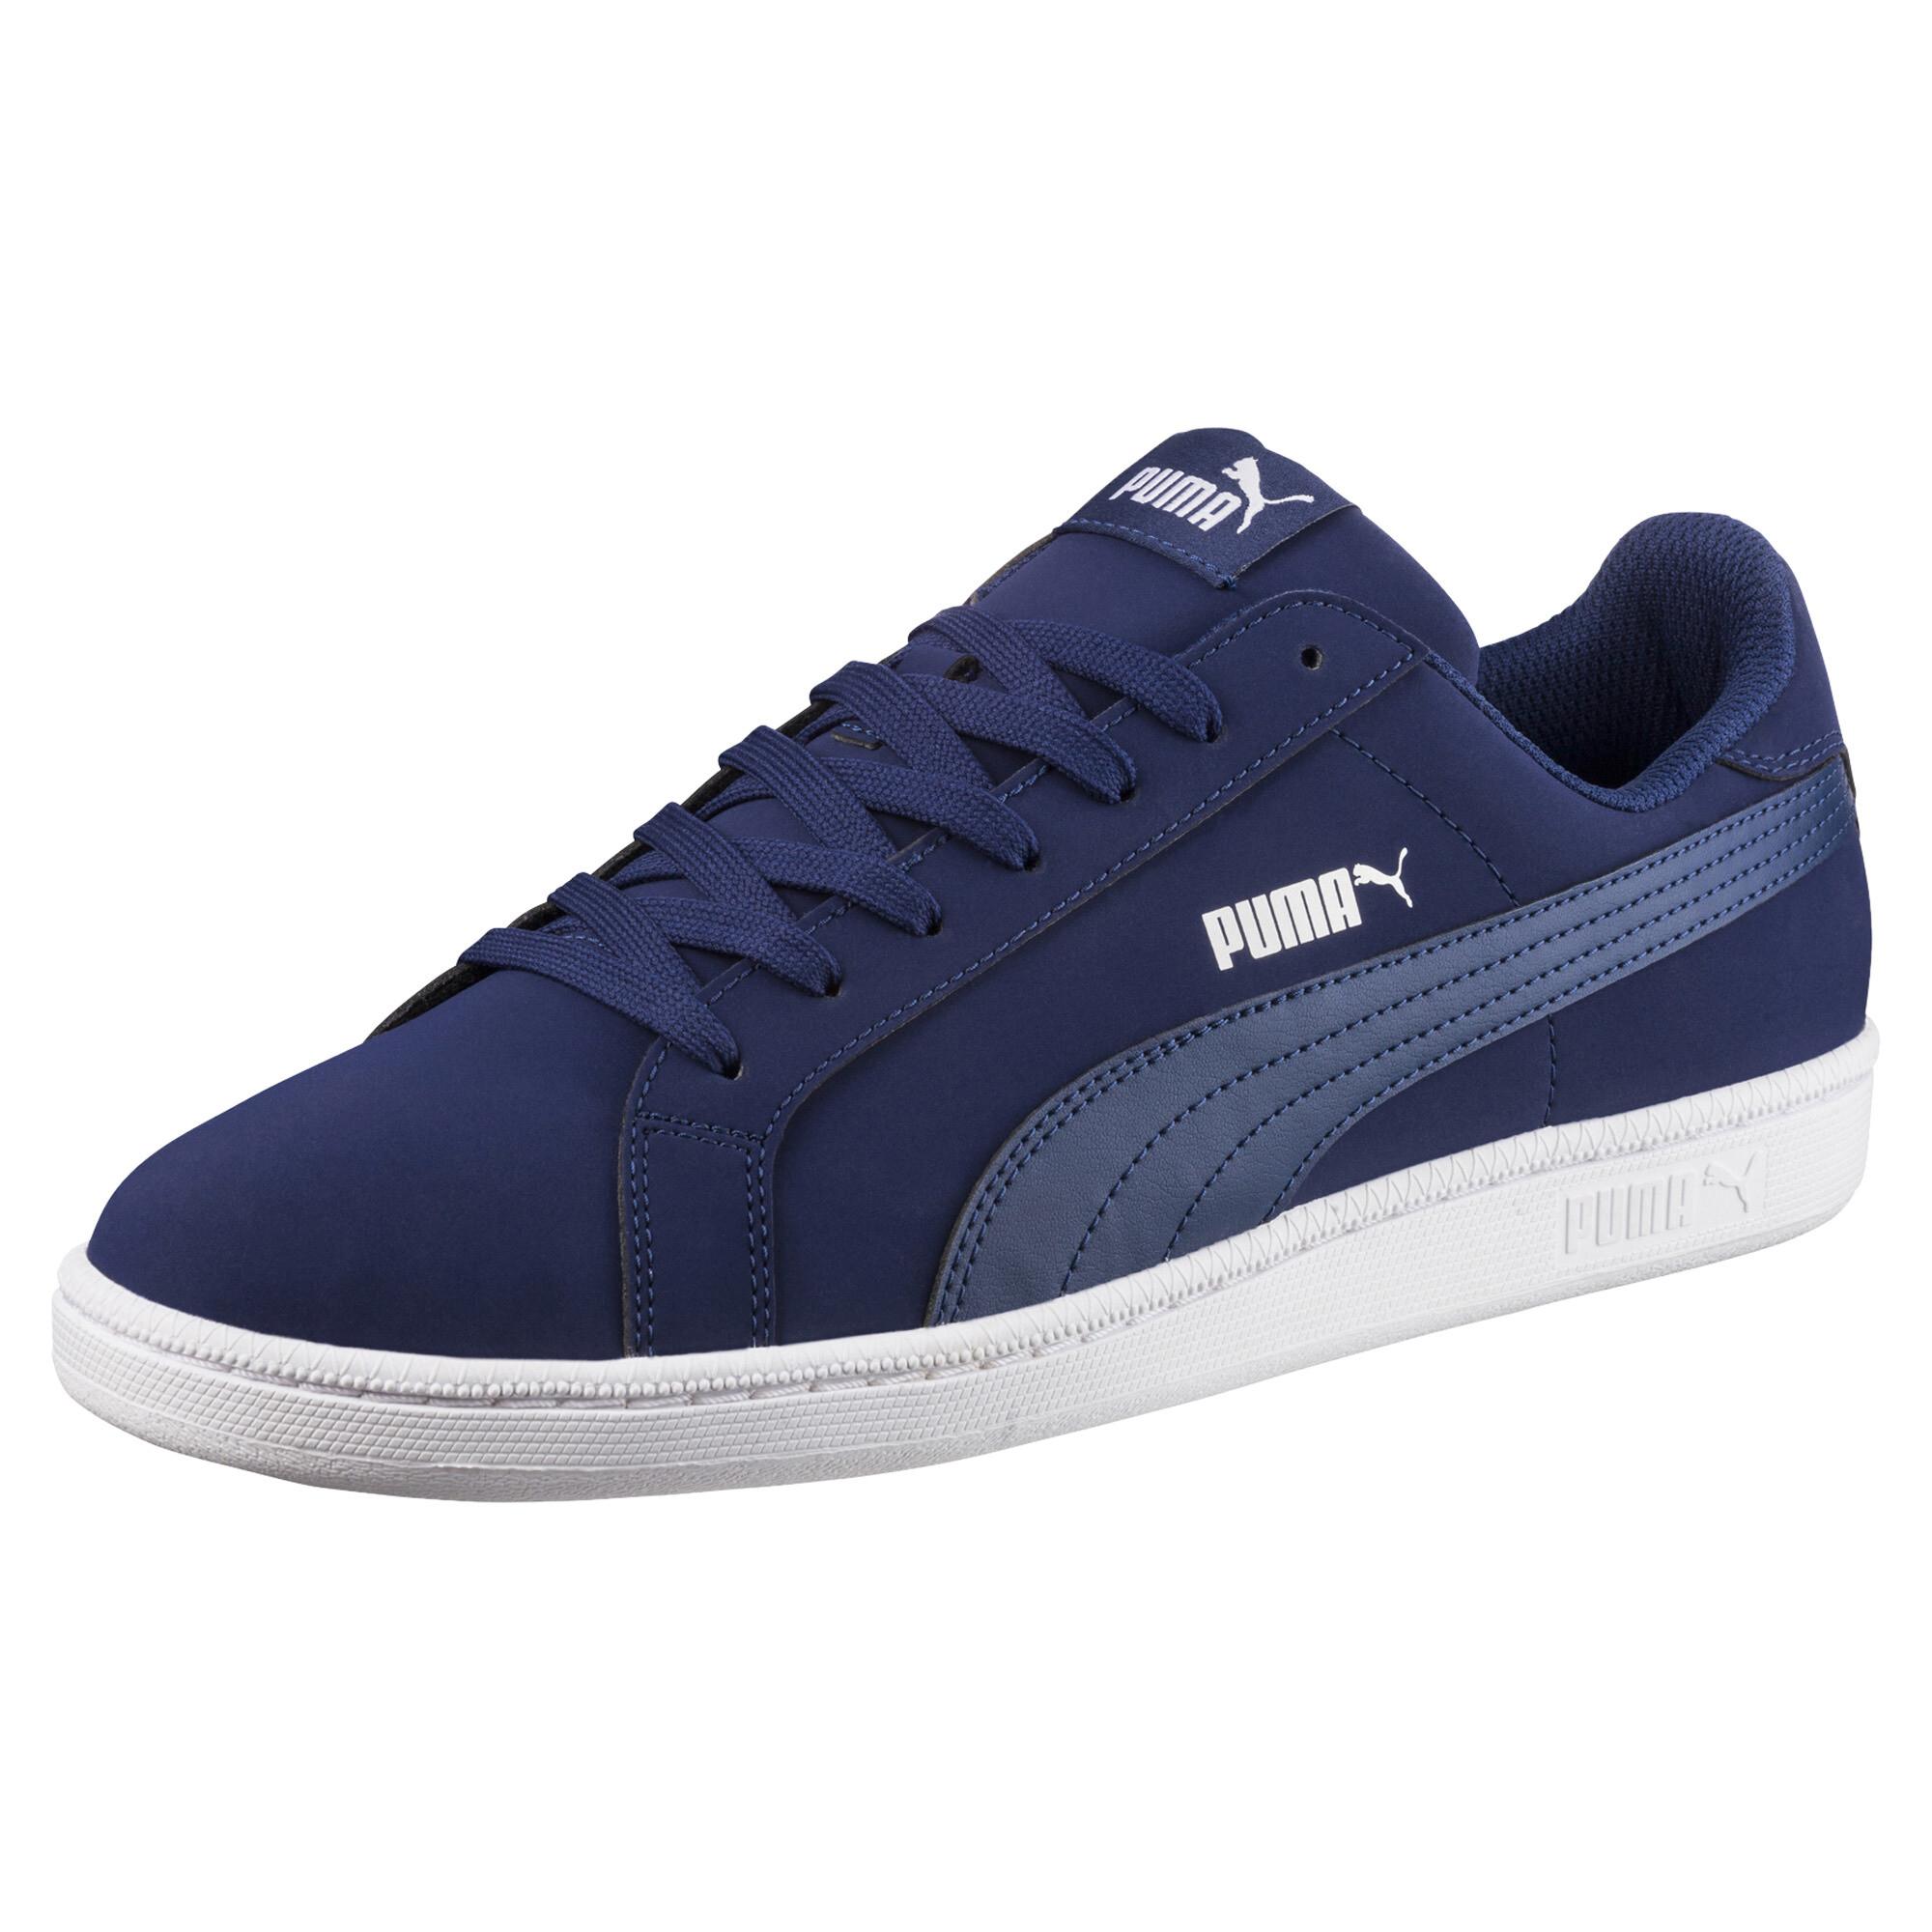 Indexbild 4 - PUMA Smash Buck Sneaker Unisex Schuhe Sport Classics Neu